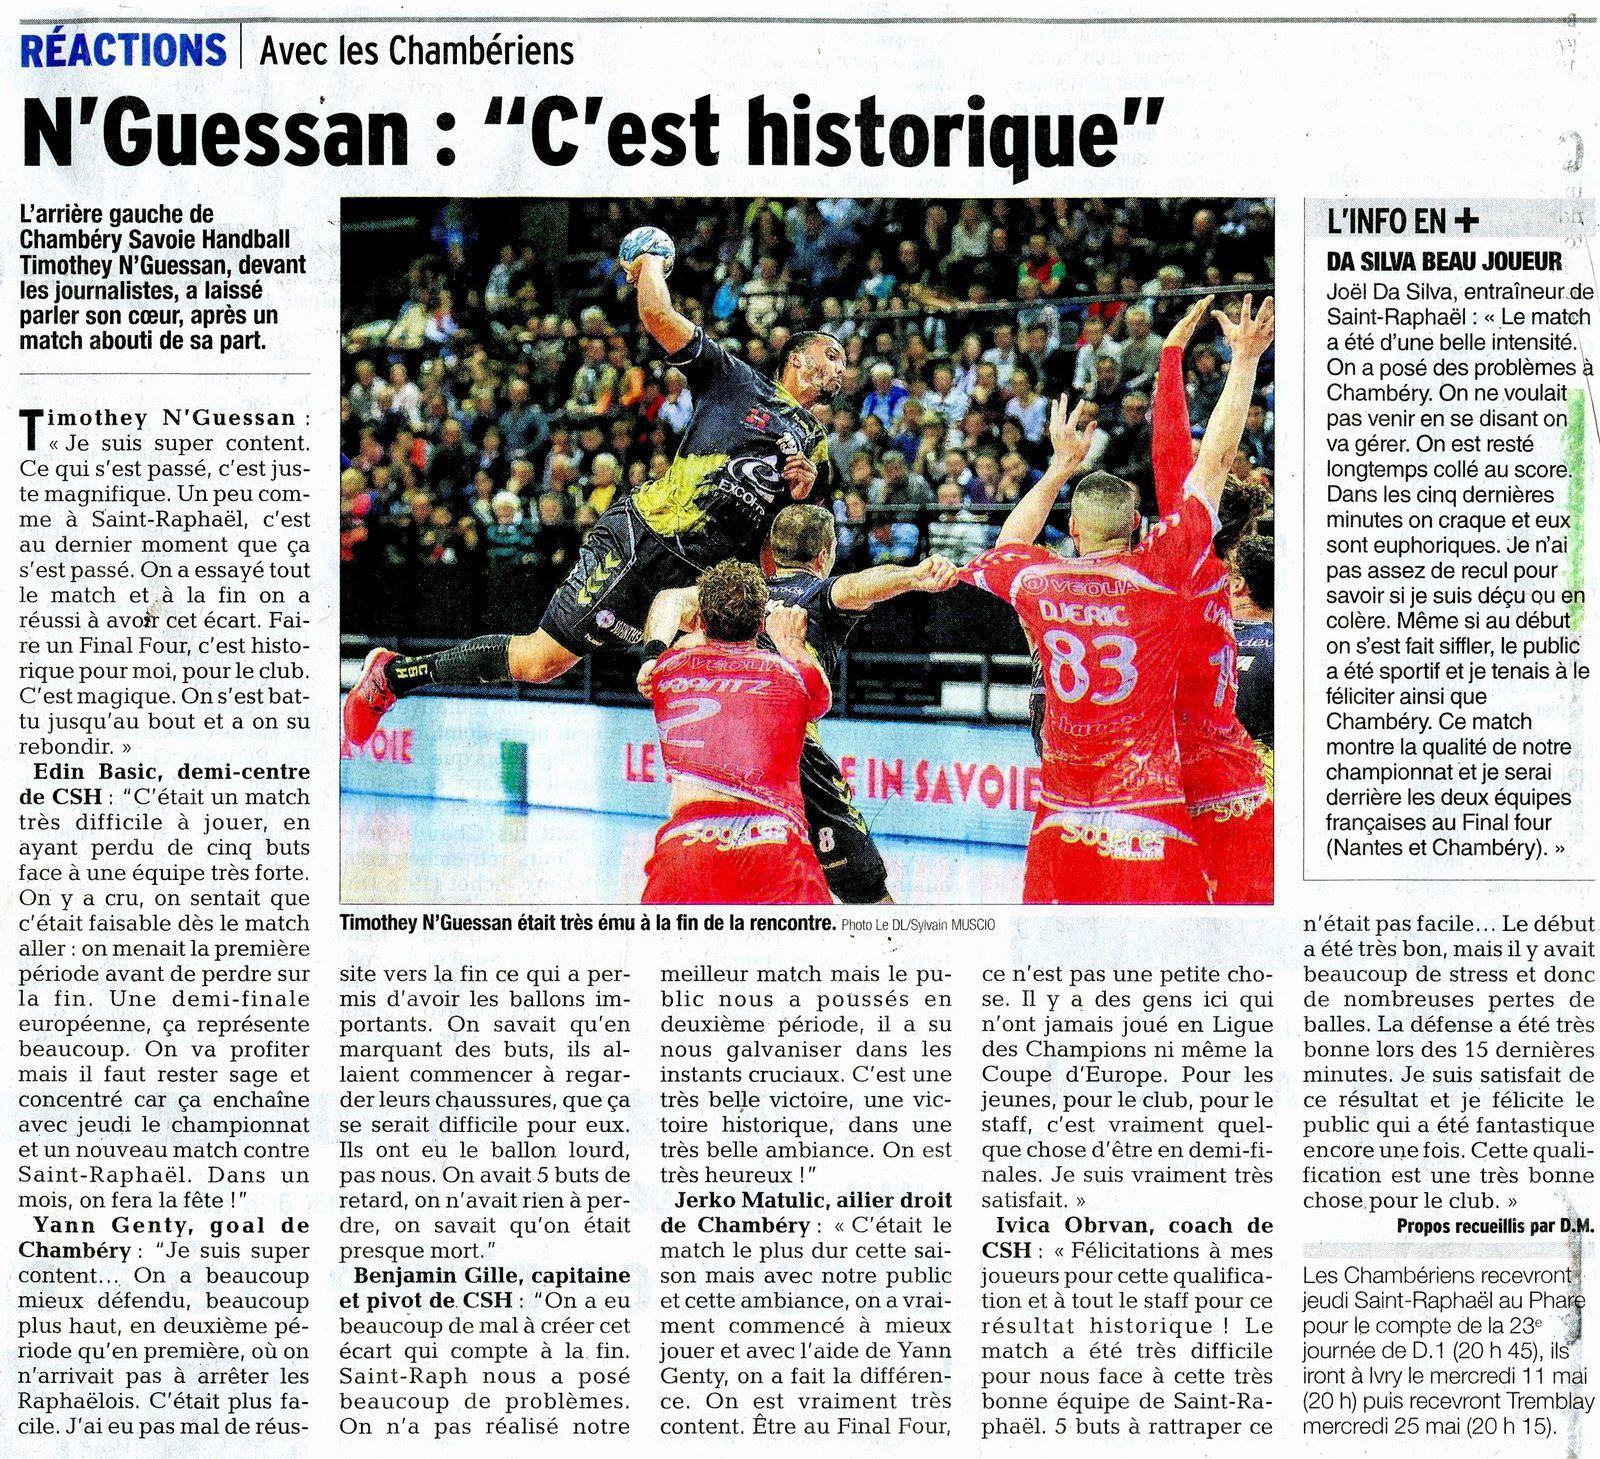 Article DL / EHF CHAMBERY - SAINT RAPHAEL 2 Mai 2016